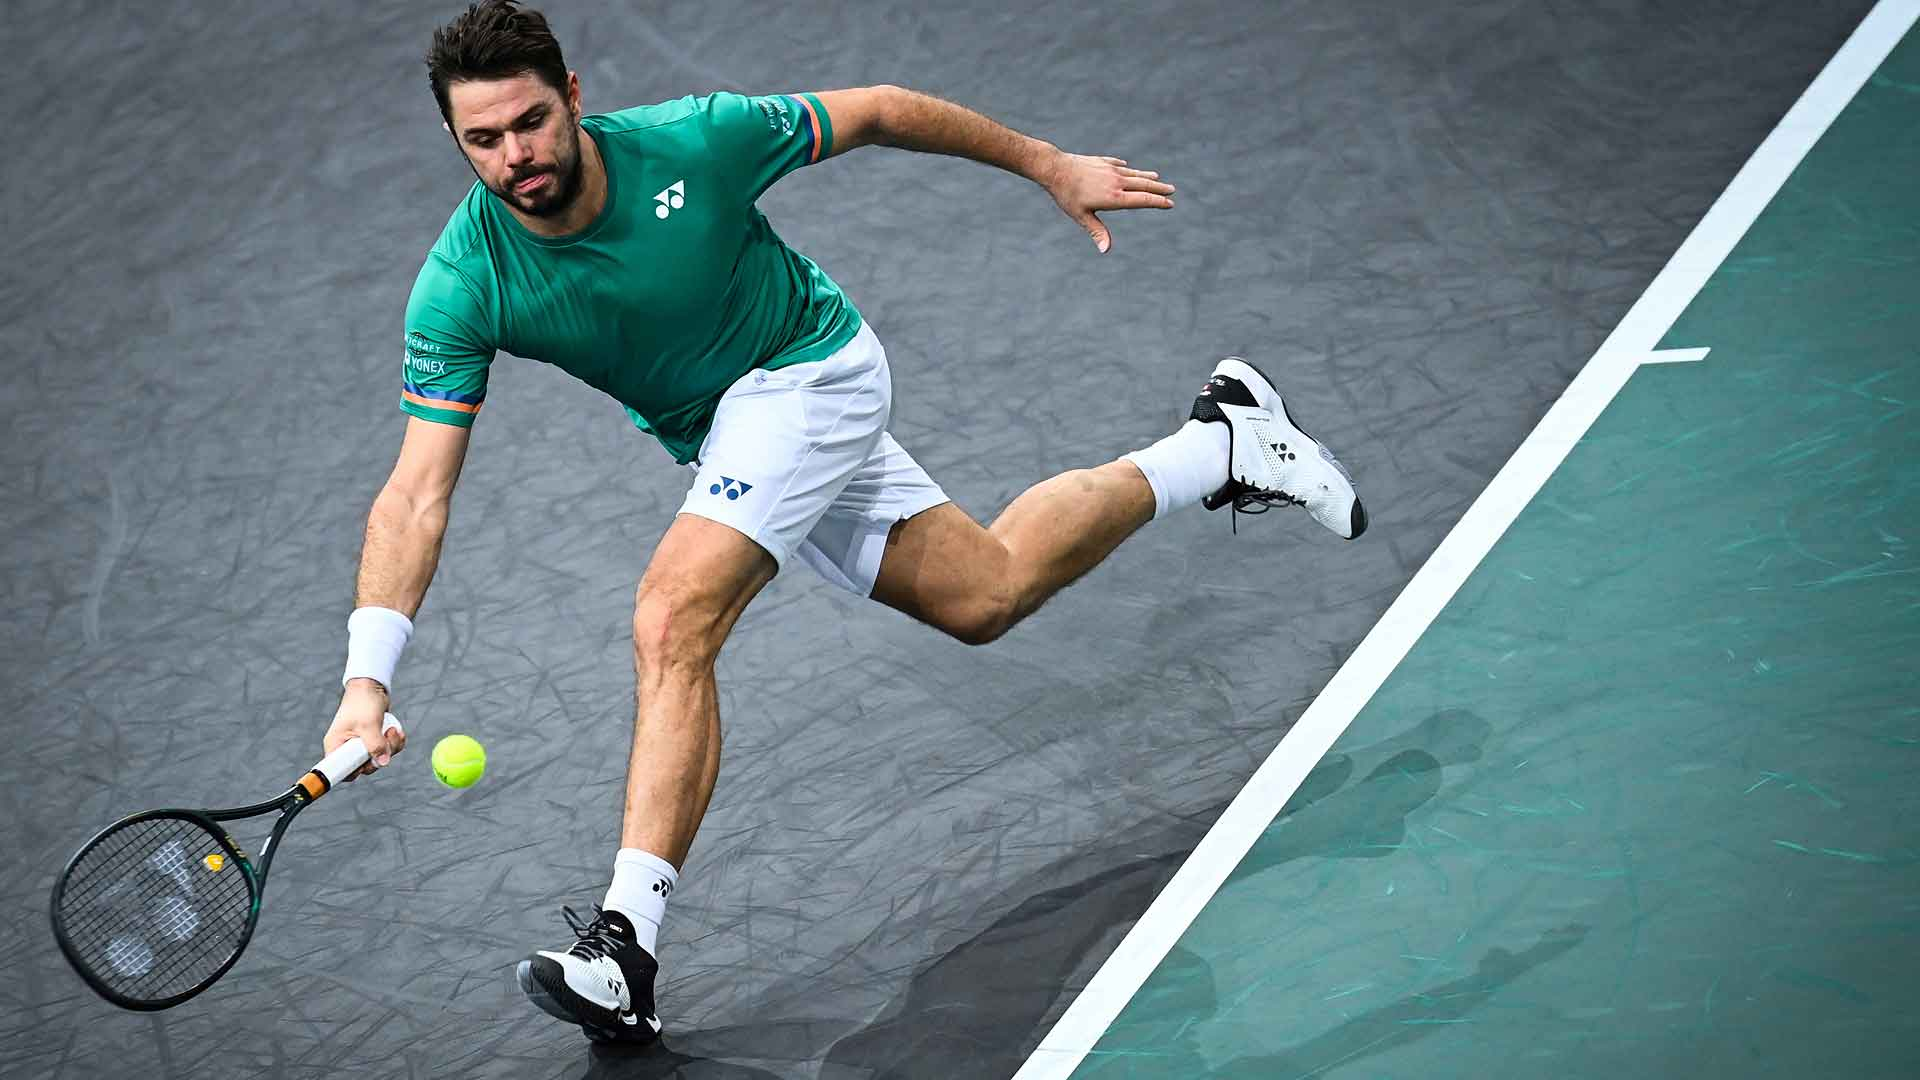 Stan Wawrinka Hits 35 Winners Against Daniel Evans To Reach Paris Second Round Atp Tour Tennis